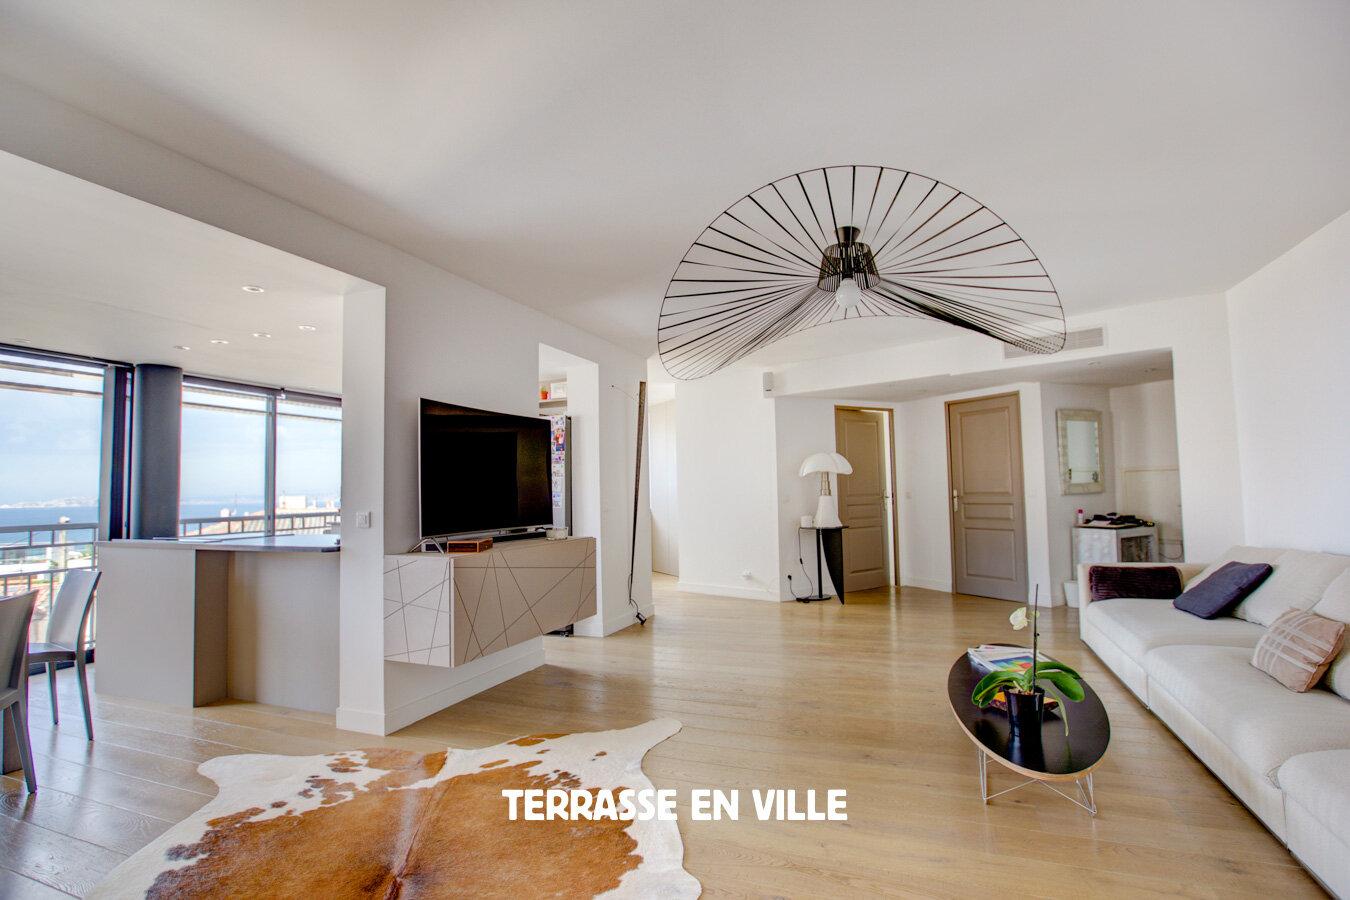 terrasse-10.jpg